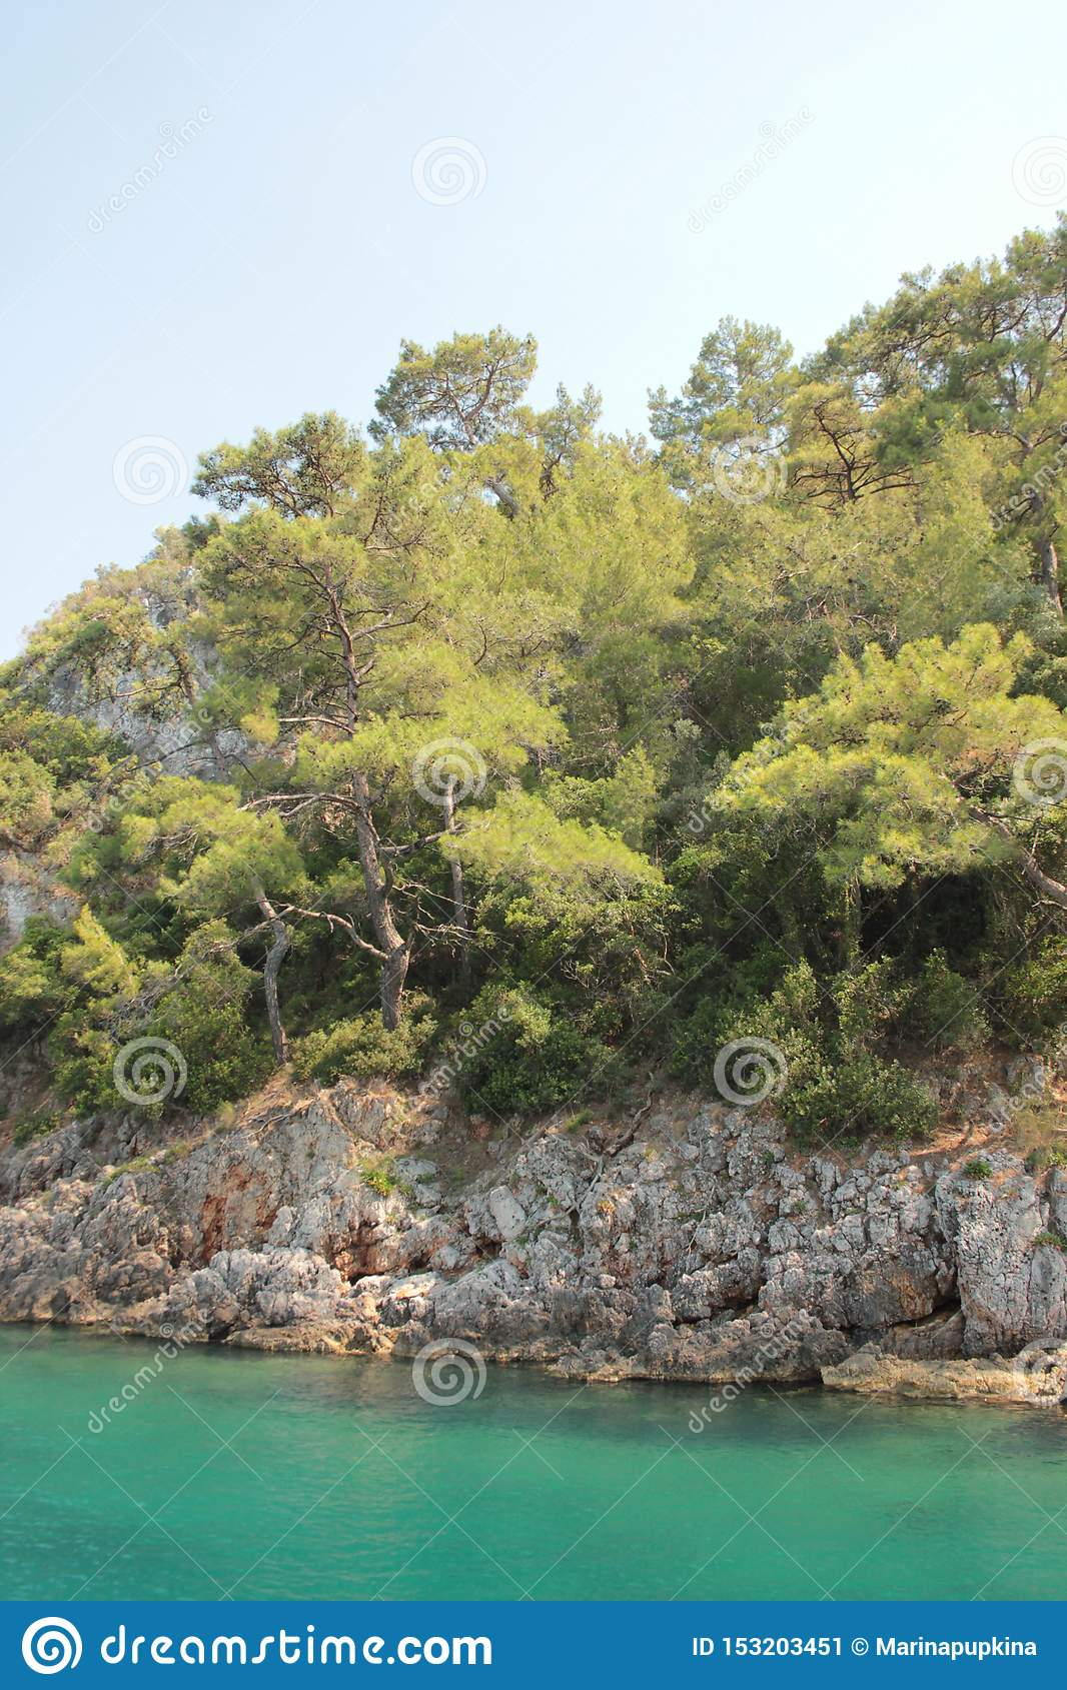 Blue lagoon in the Aegean Sea.